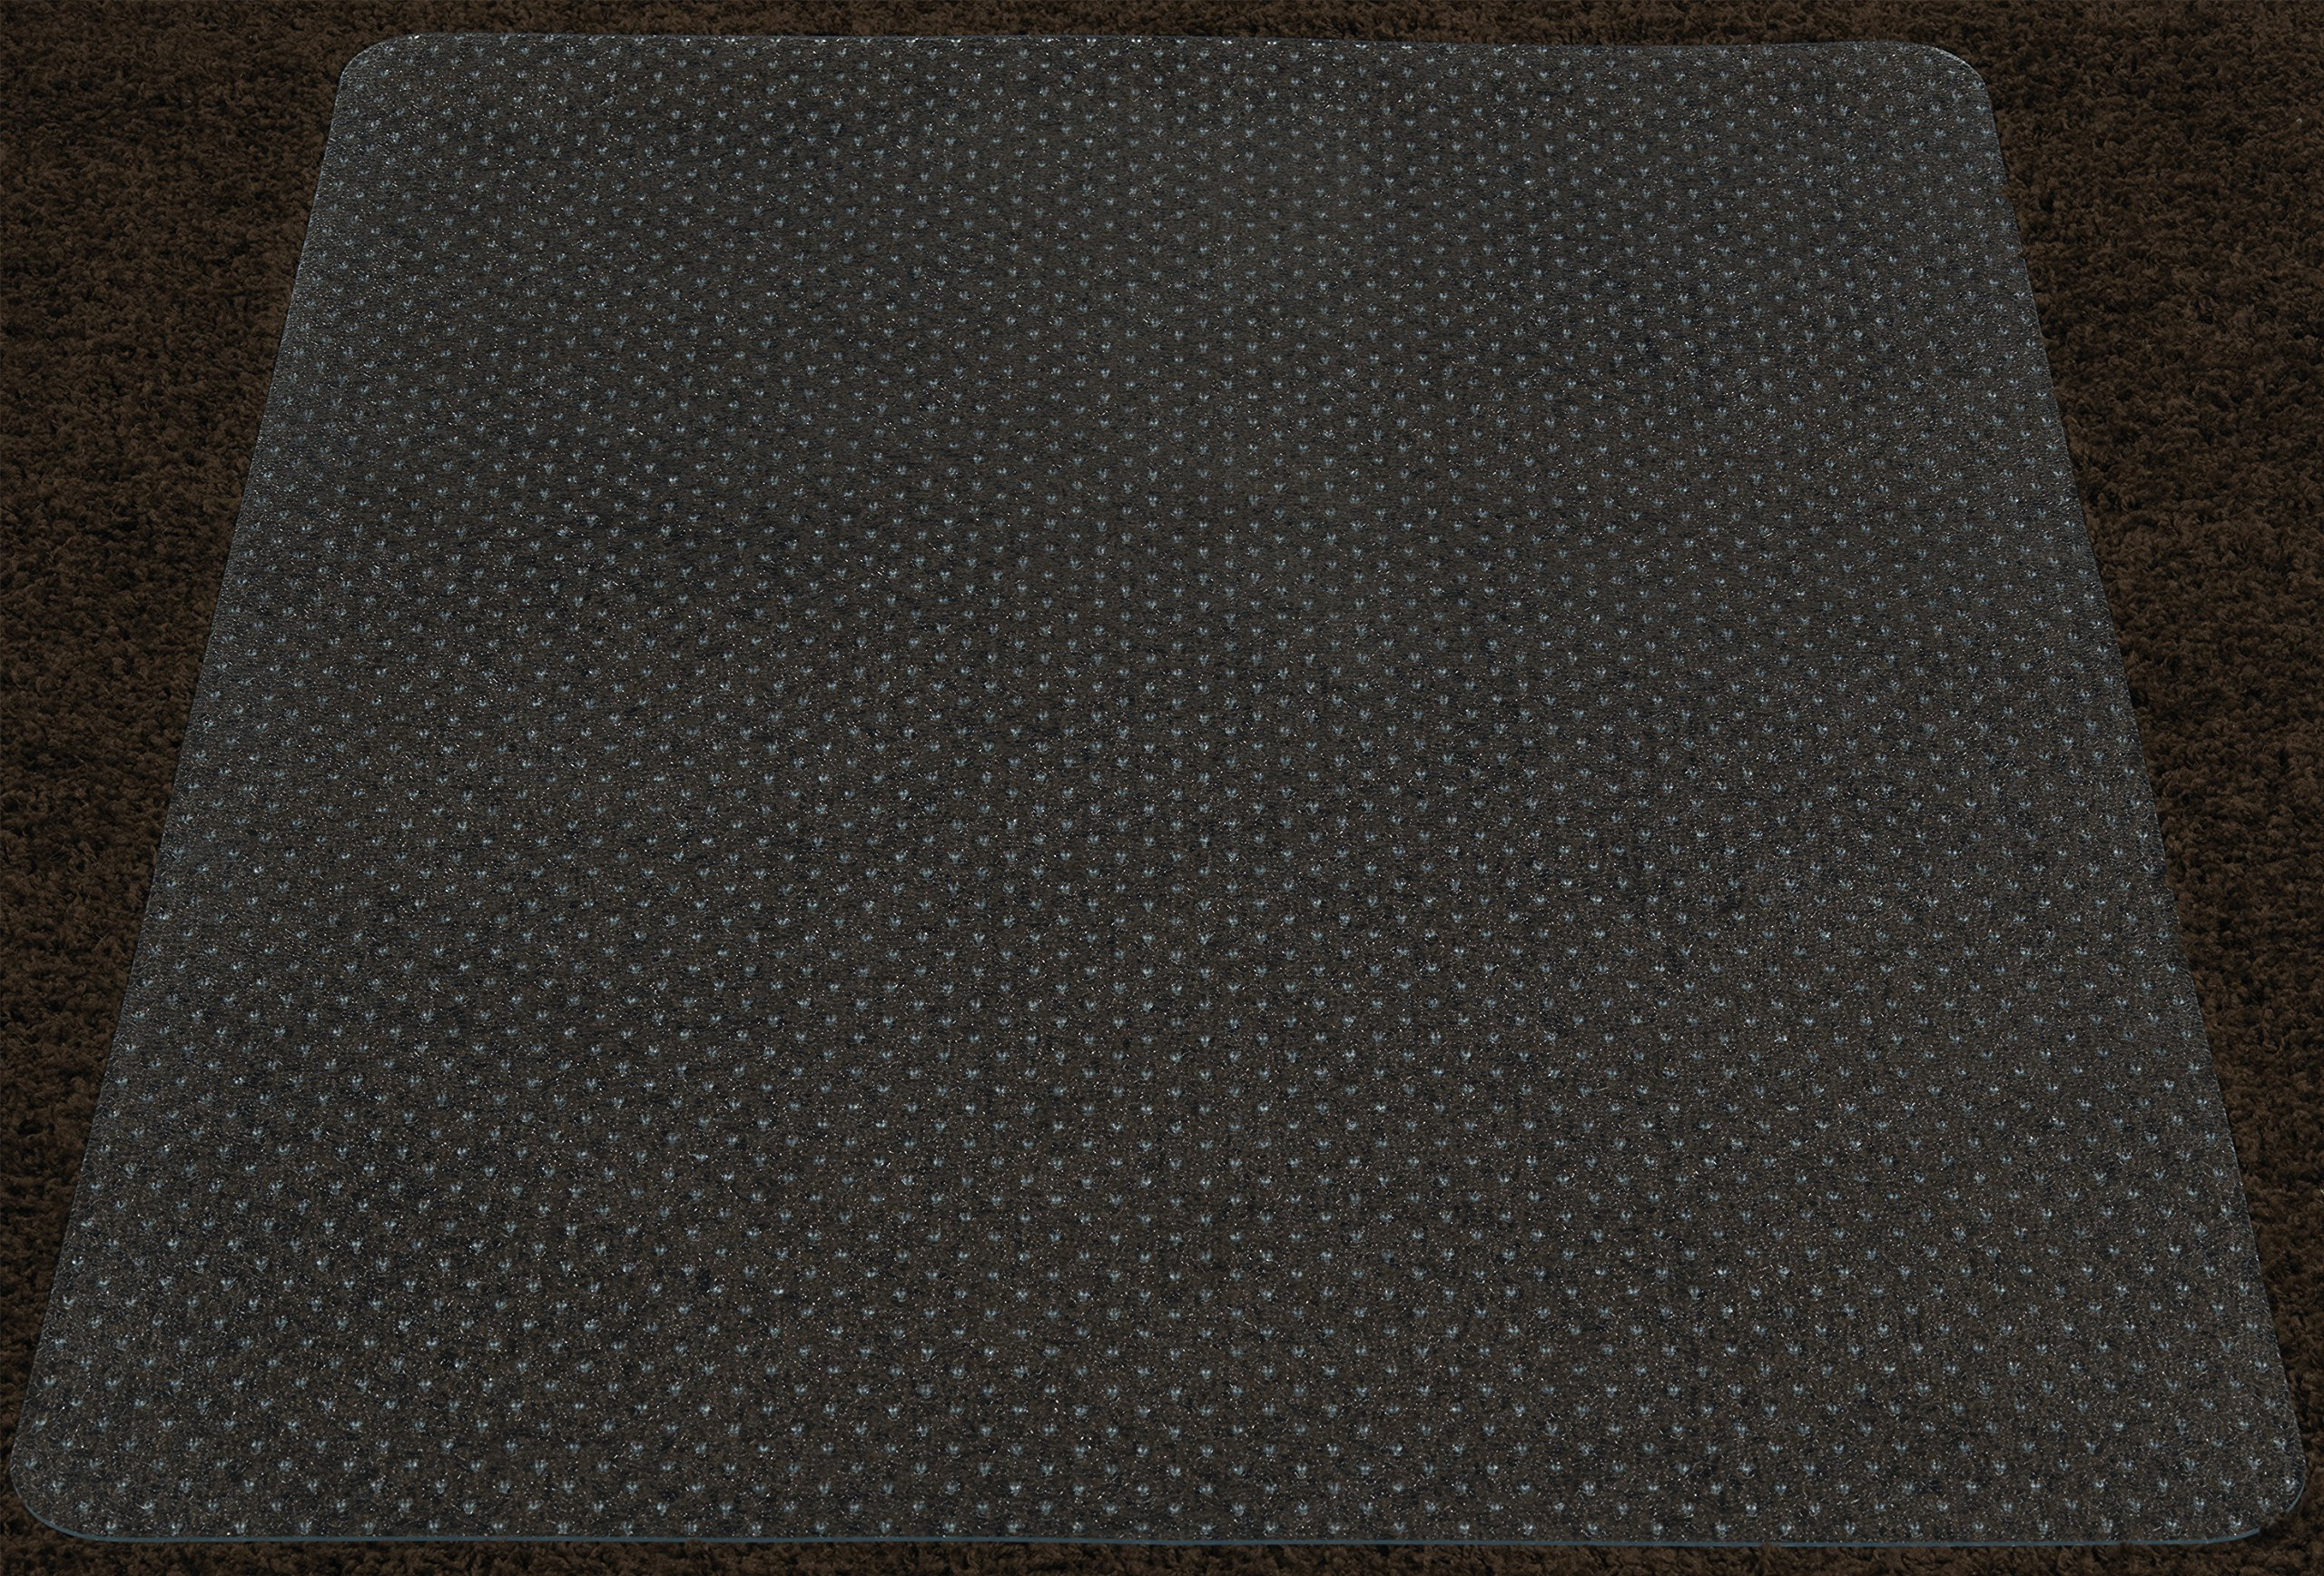 Ottomanson Carpet Chair 36''X48'' Plastic Mat Protector, 36'' x 48'', Clear